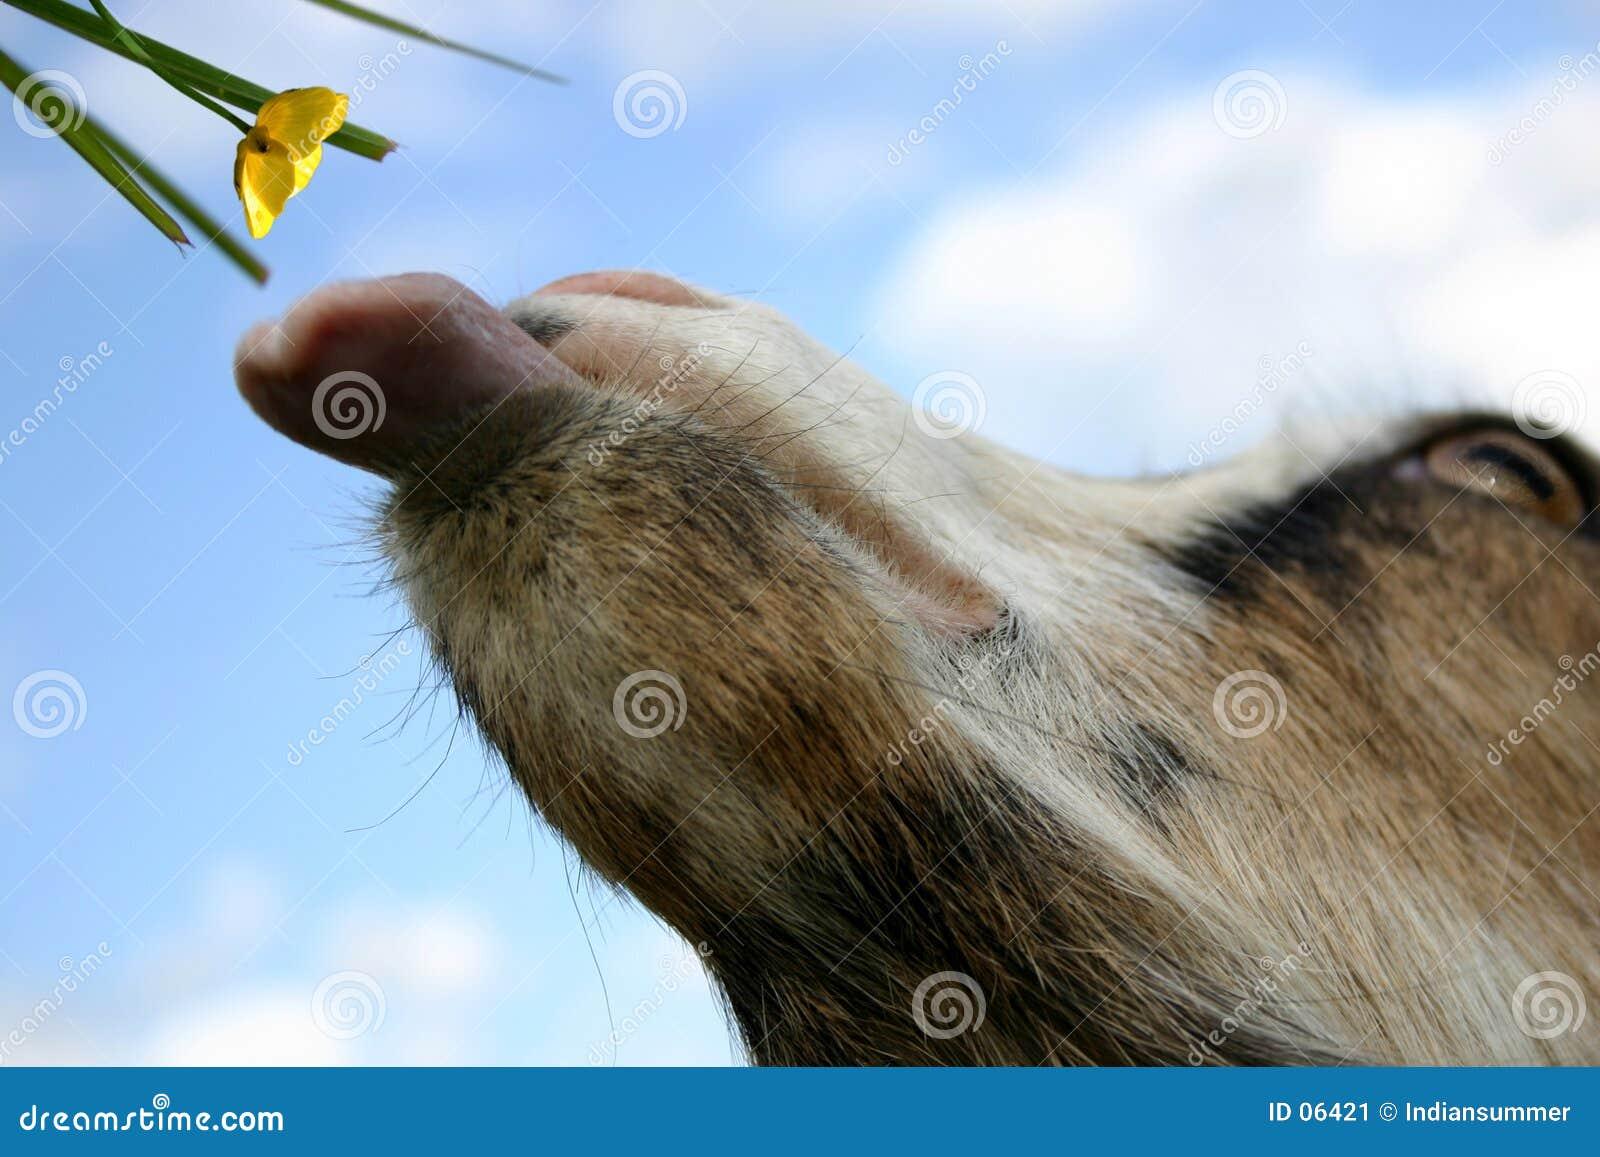 Una capra: È tempo di mangiare!